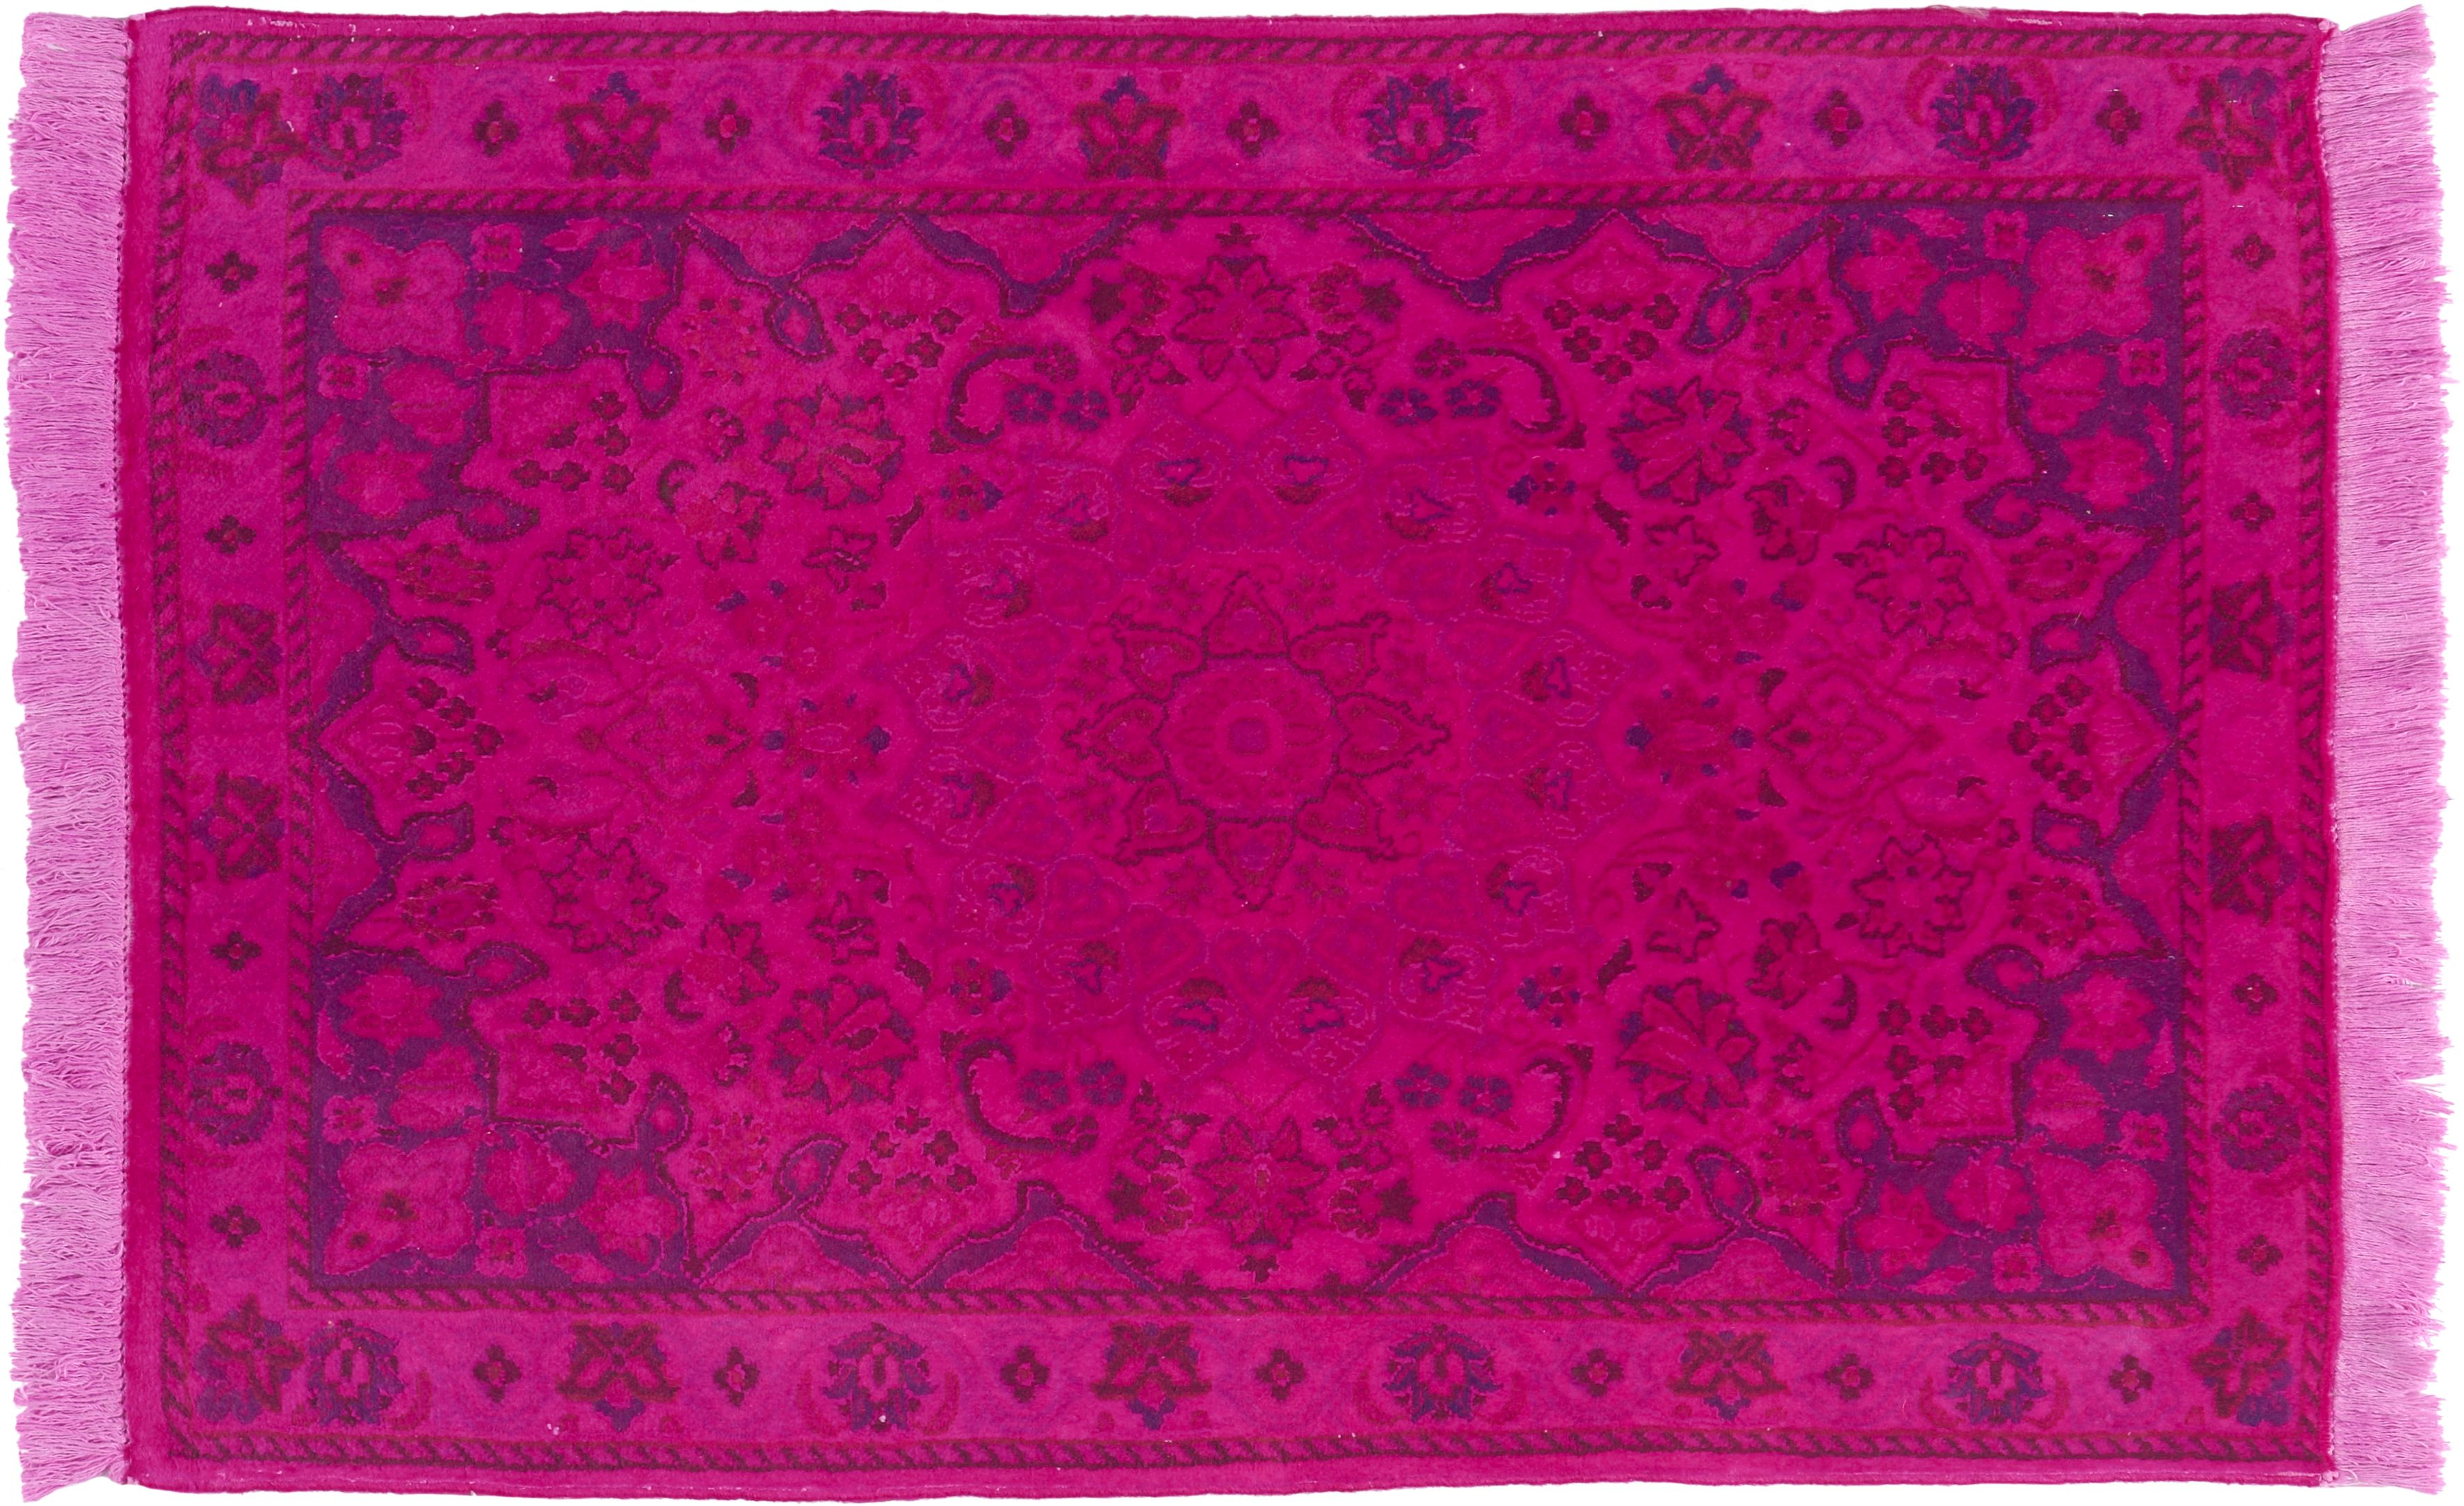 Pink Er Teppich By Kiskan Process Hamburg